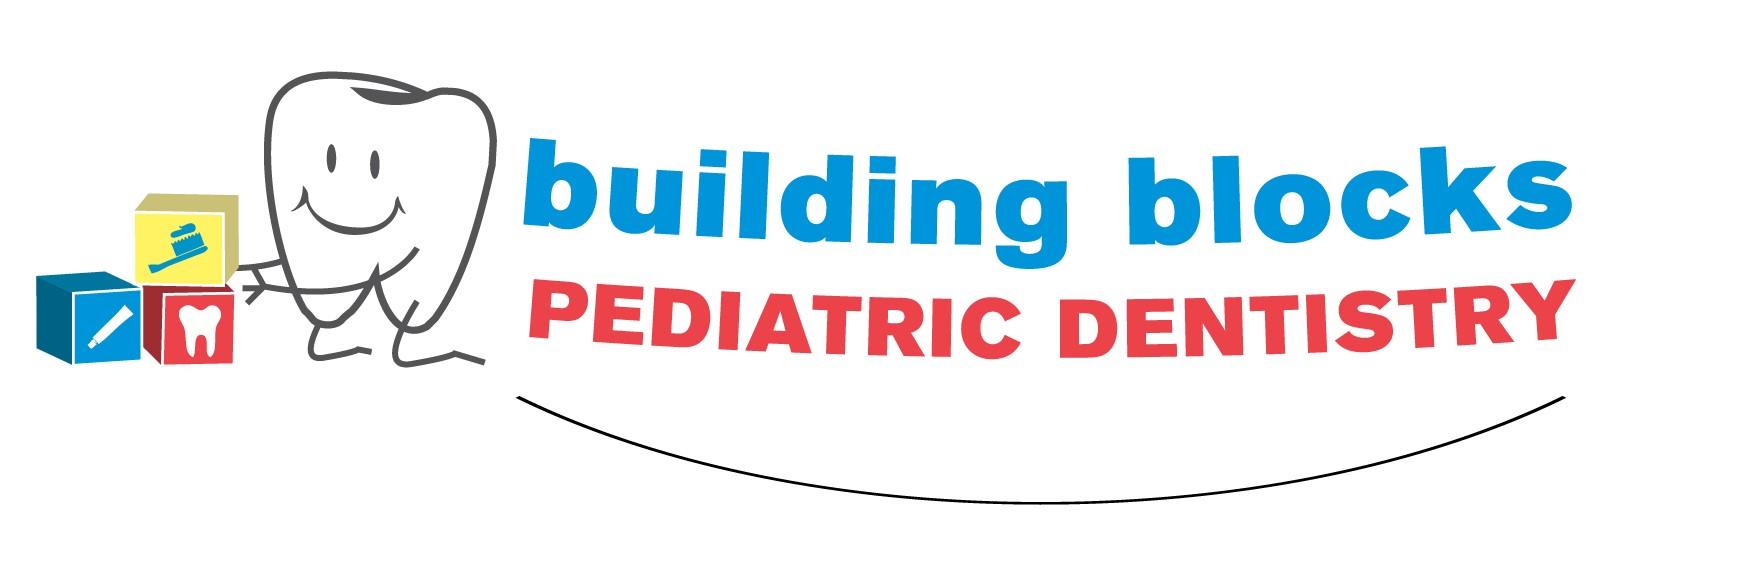 building blocks pediatric dentistry